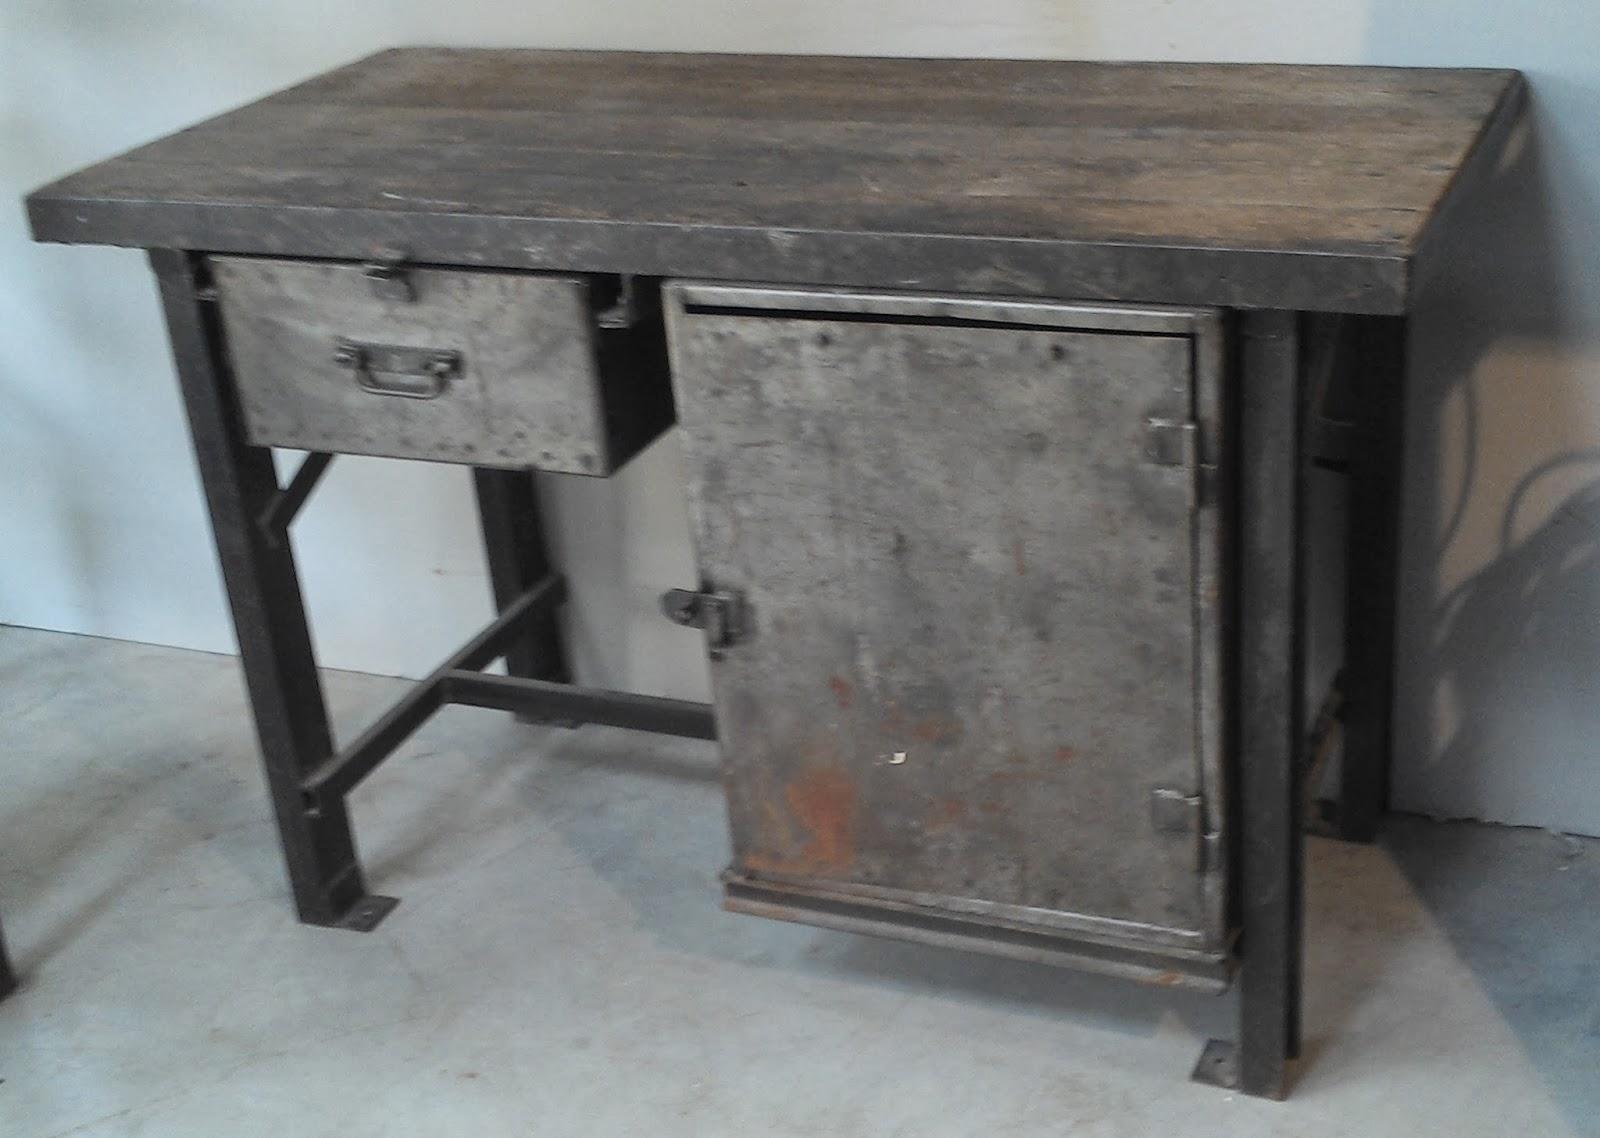 ancien meuble m tier m tal bross atelier industriel etabli. Black Bedroom Furniture Sets. Home Design Ideas